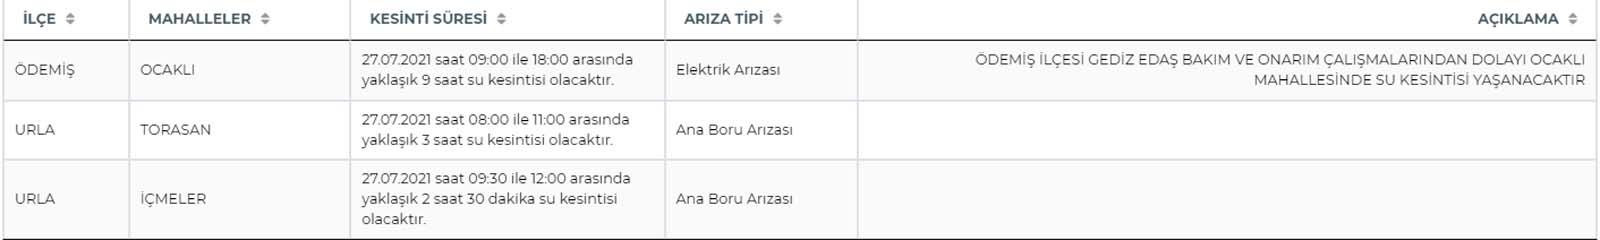 İzmir İZSU su kesintisi 27 Temmuz Salı | İstanbul İSKİ su kesintisi 27 Temmuz Salı | Ankara ASKİ su kesintisi 27 Temmuz Salı